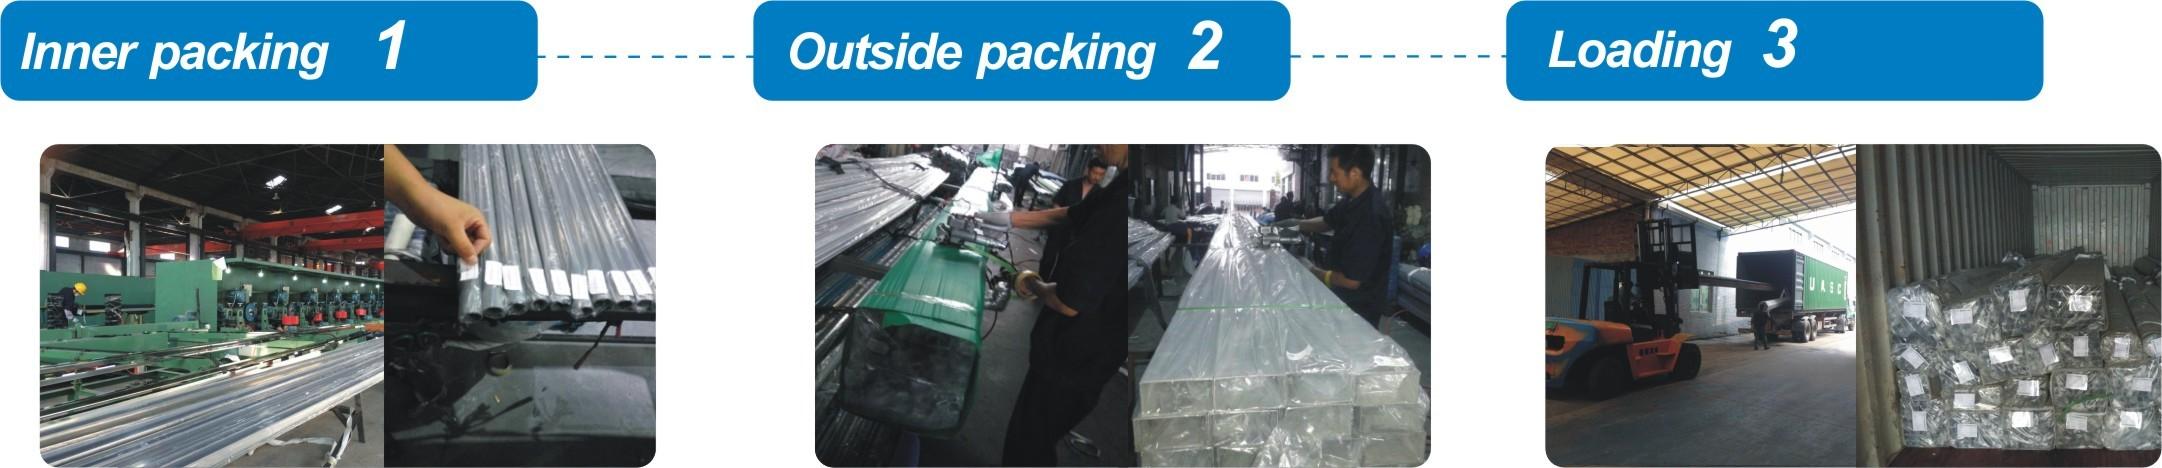 stainless steel tube packaging